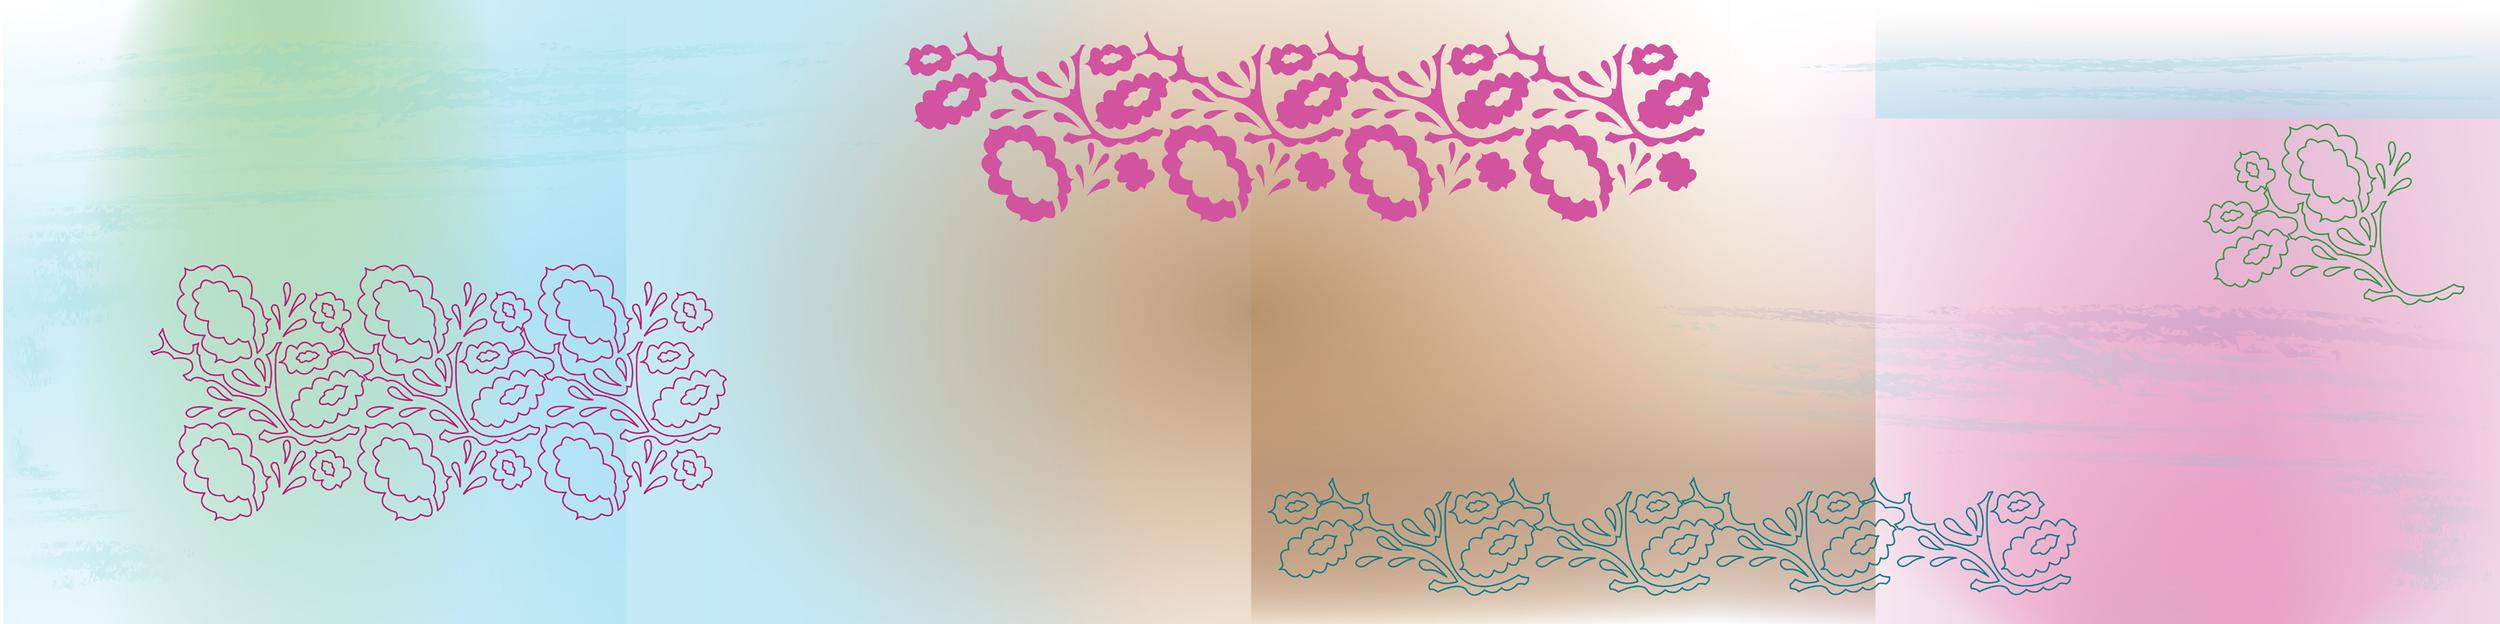 Design for 4 ceiling tiles for Yeovil Hospital, SCBU counselling room